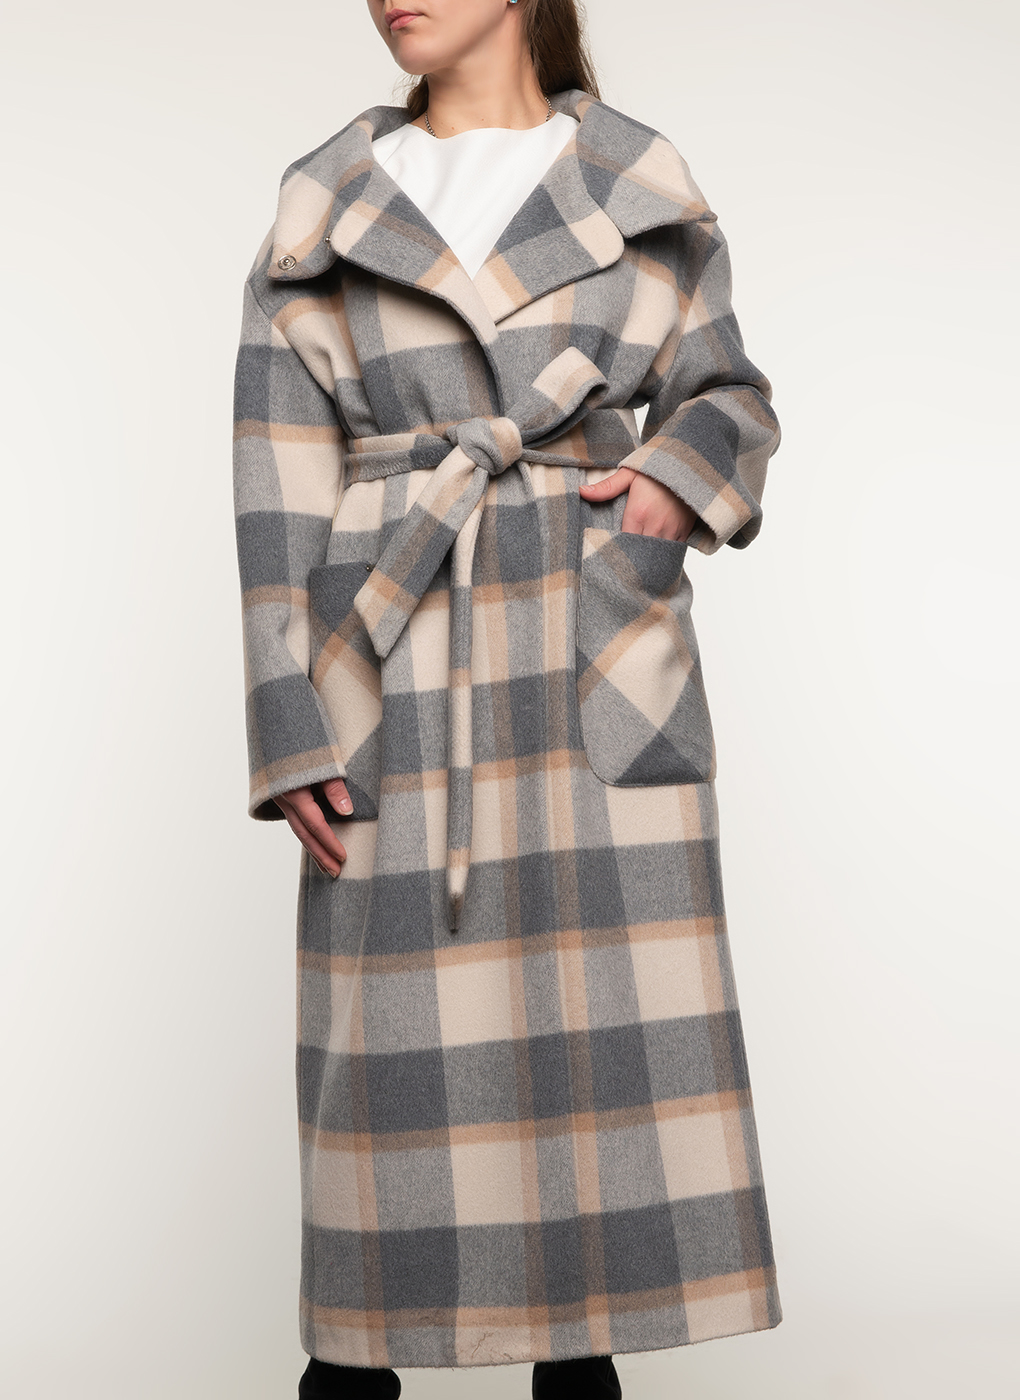 Пальто полушерстяное 115, idekka фото